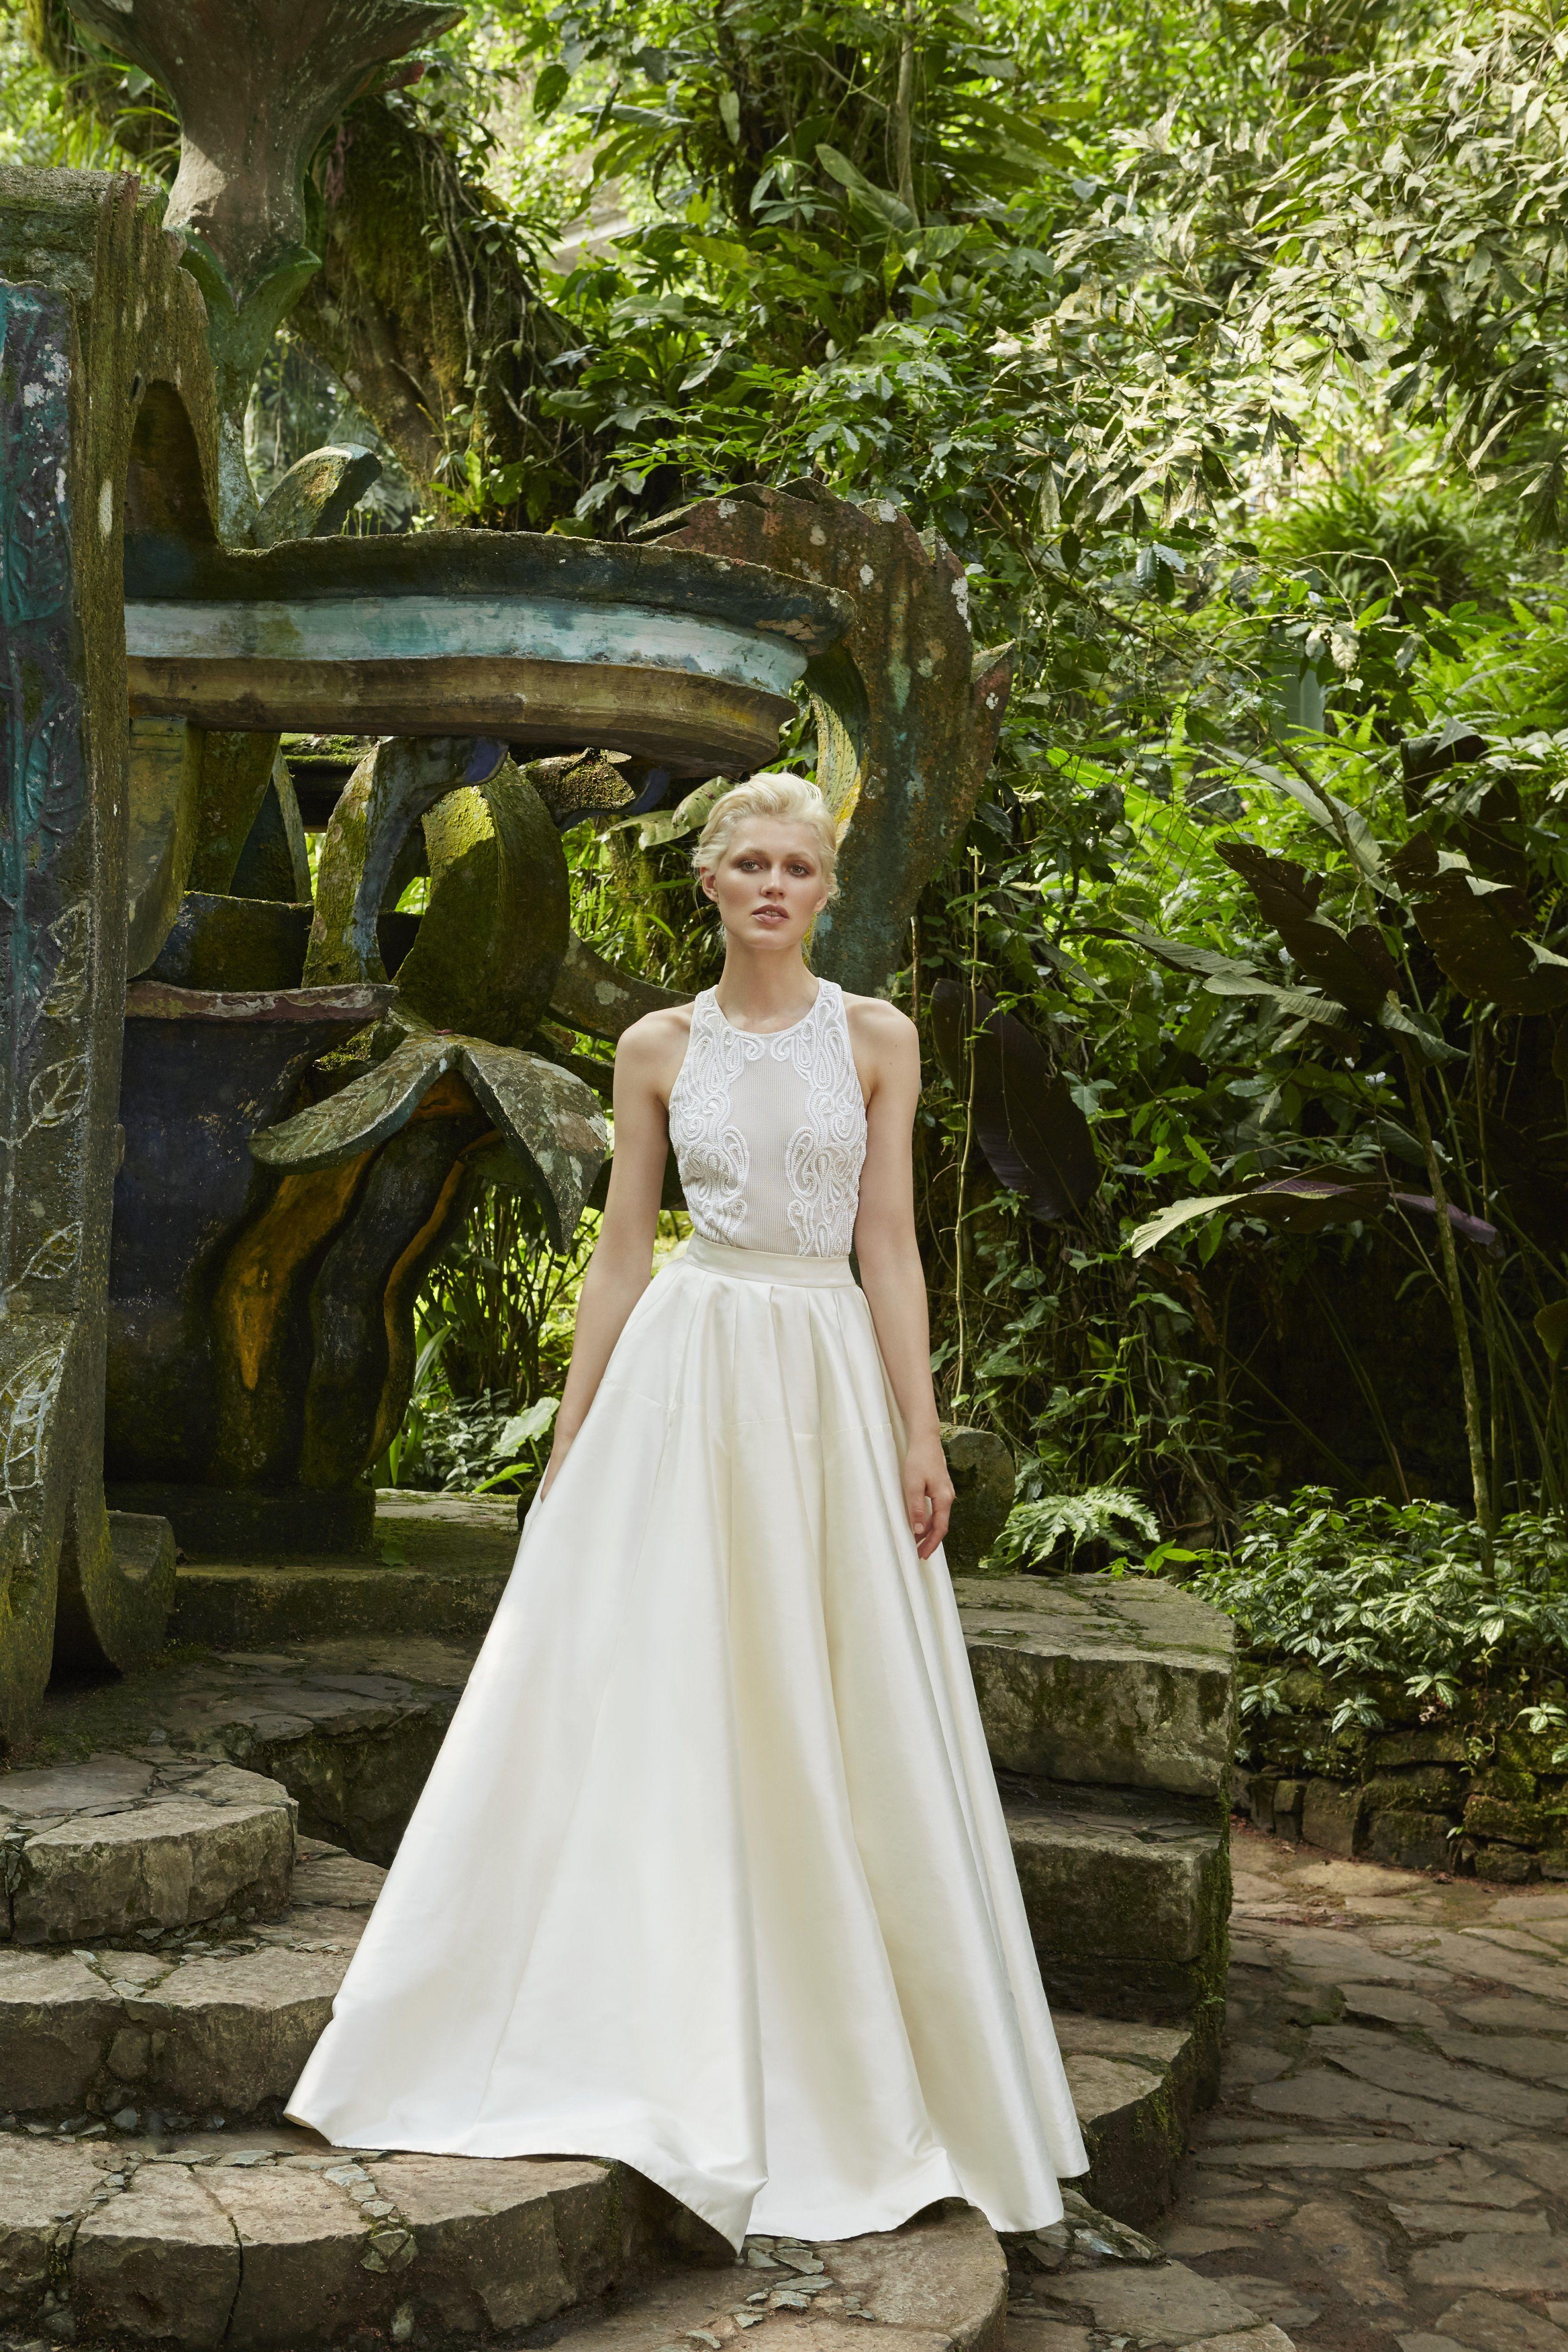 Alia bastamam wedding dress  The intricately handembroidered Art Nouveau style Skye bodice and